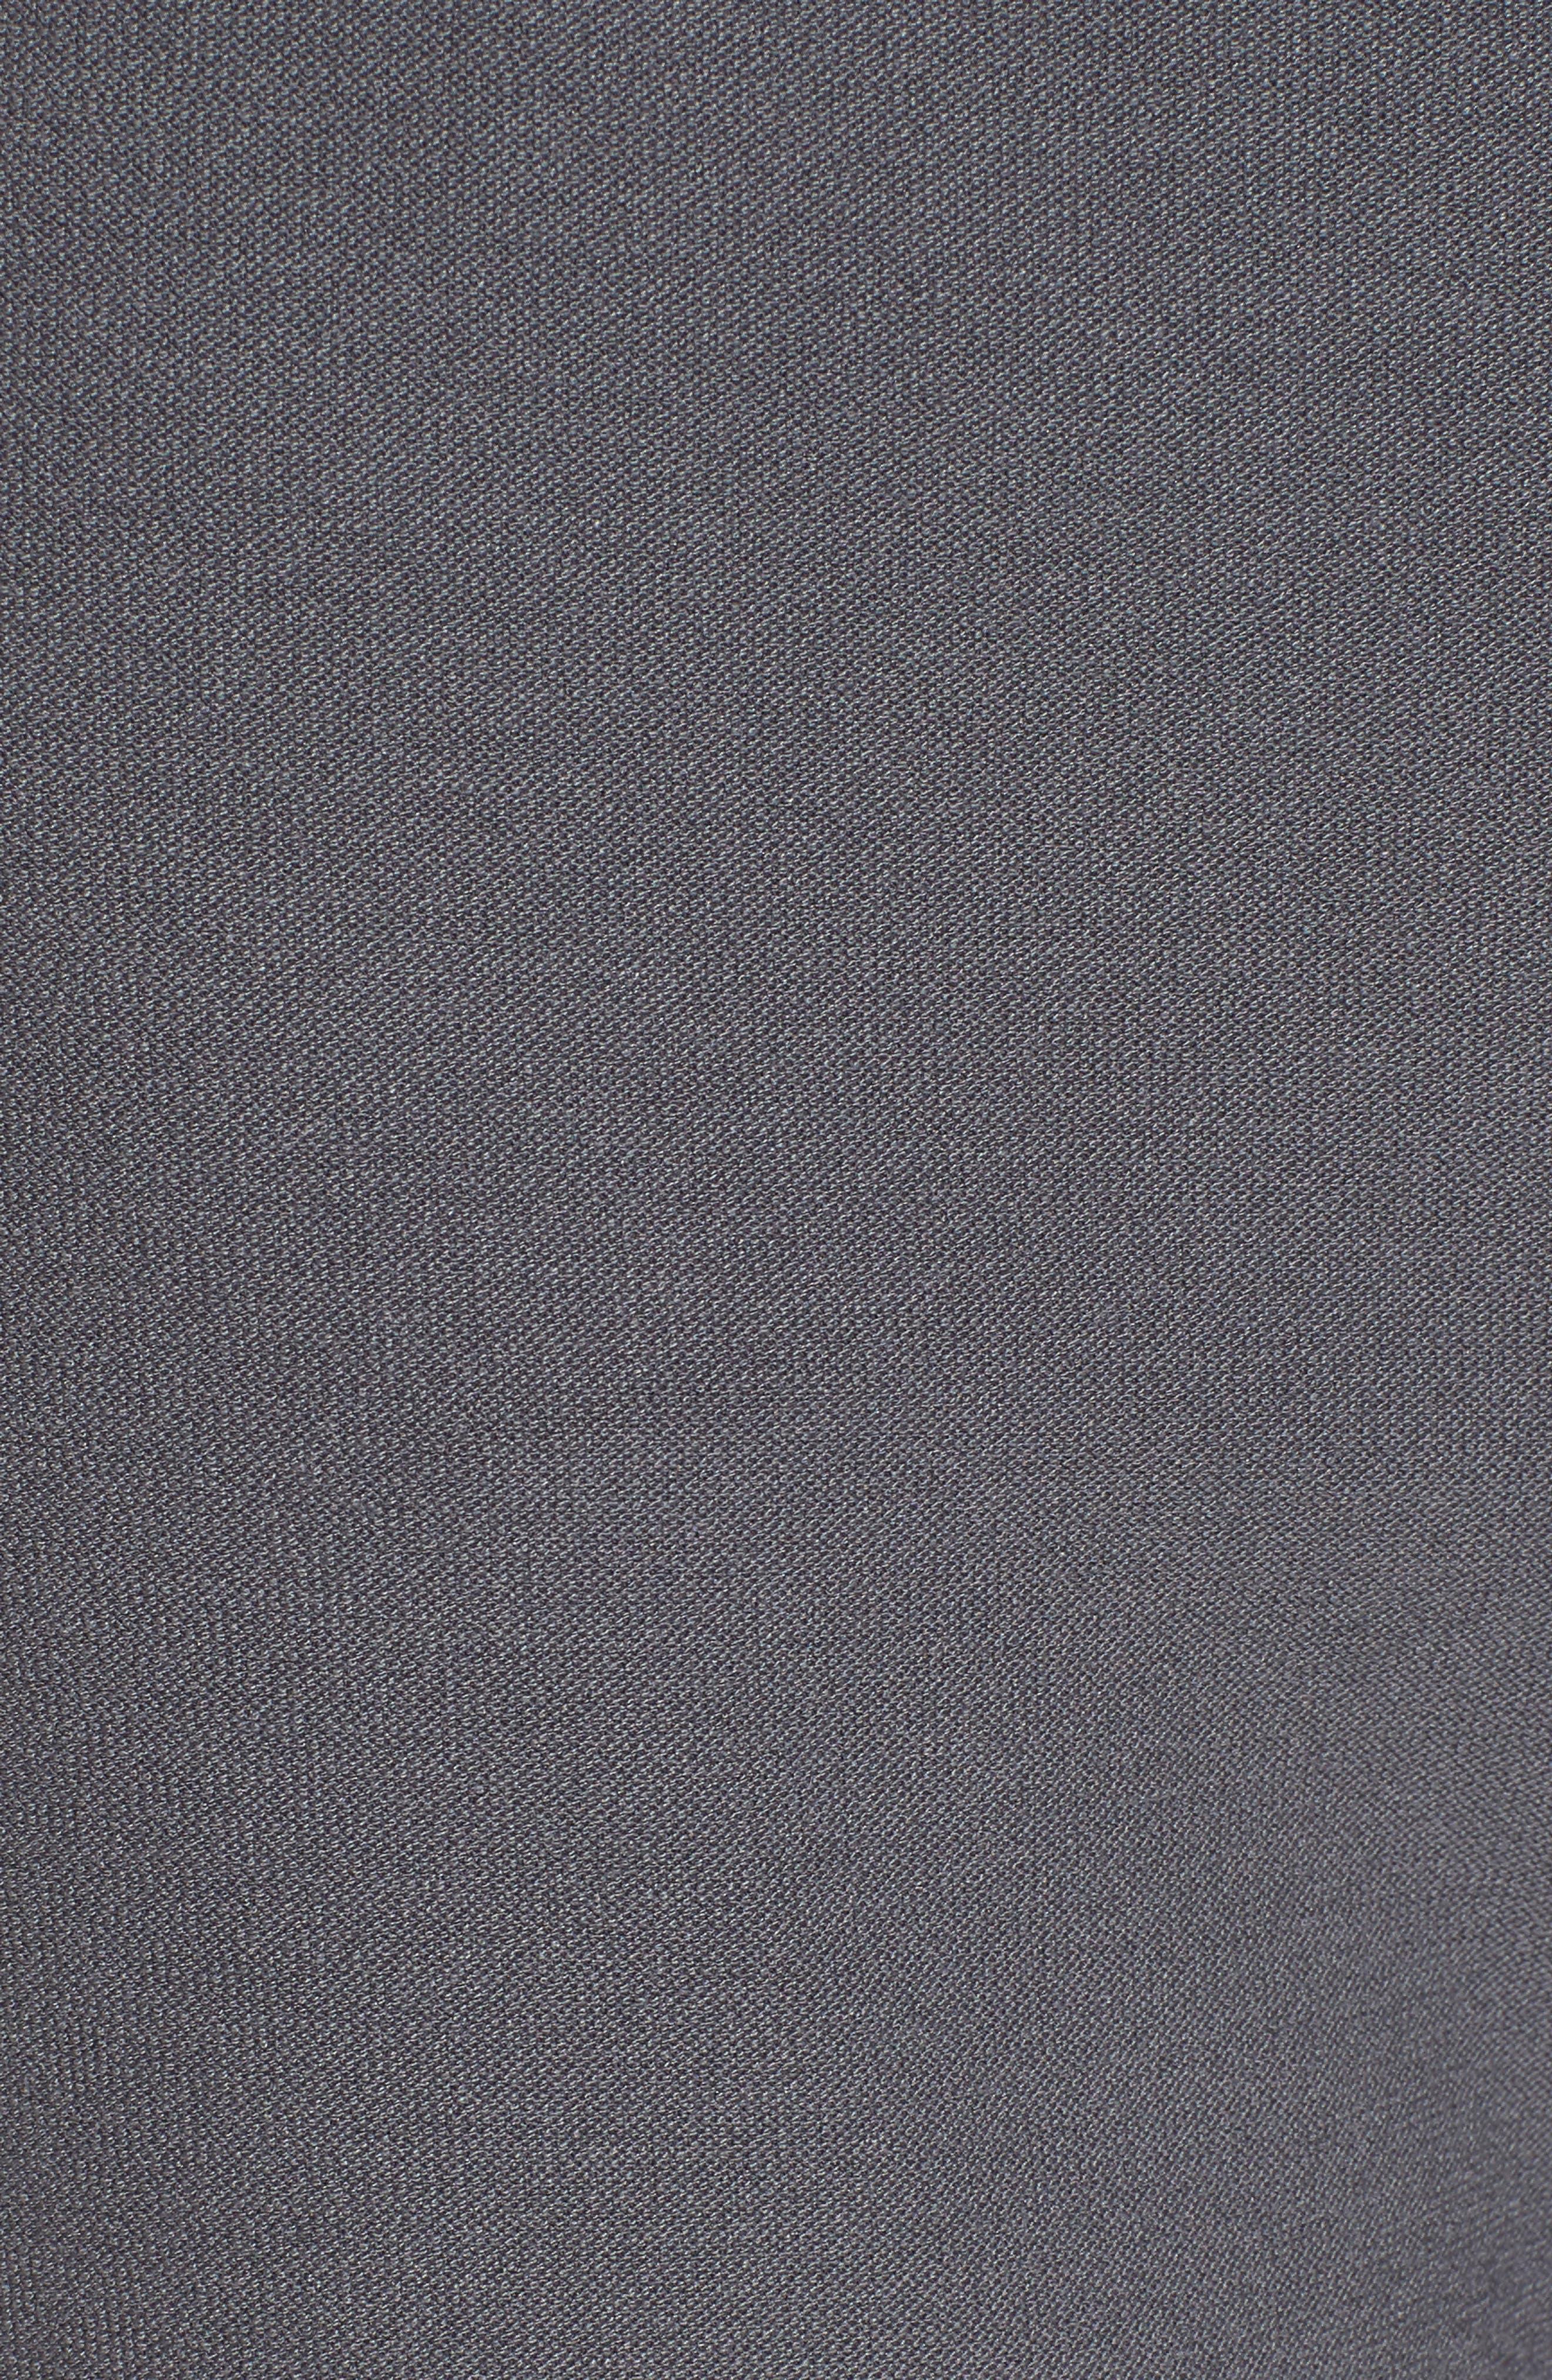 Slim Knit Pants,                             Alternate thumbnail 4, color,                             Ash